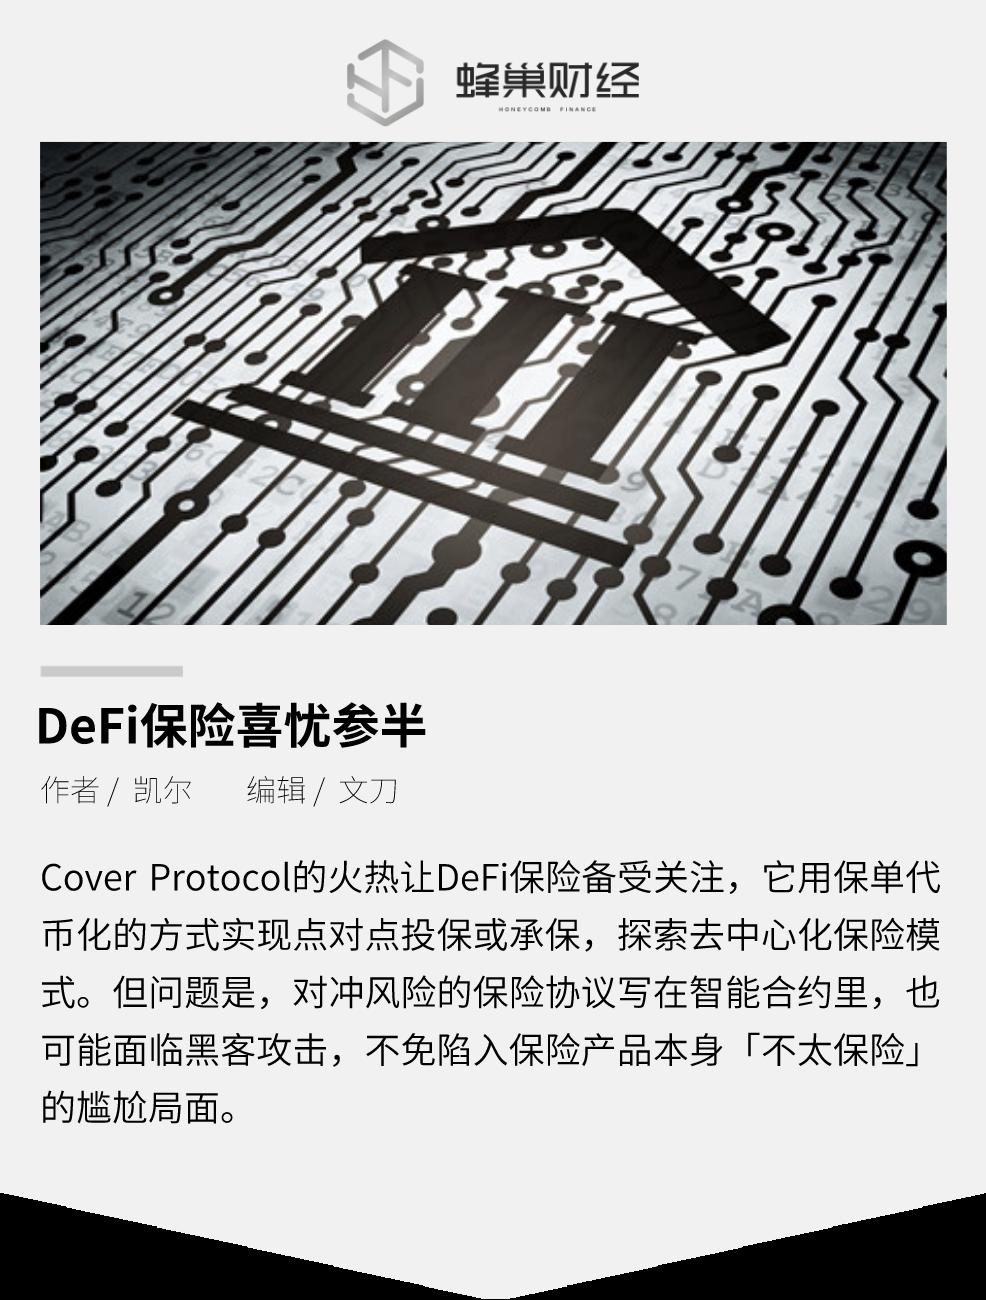 DeFi保险喜忧参半:COVER9天上涨695%,Nexus Mutual遭受攻击,损失超过800万美元